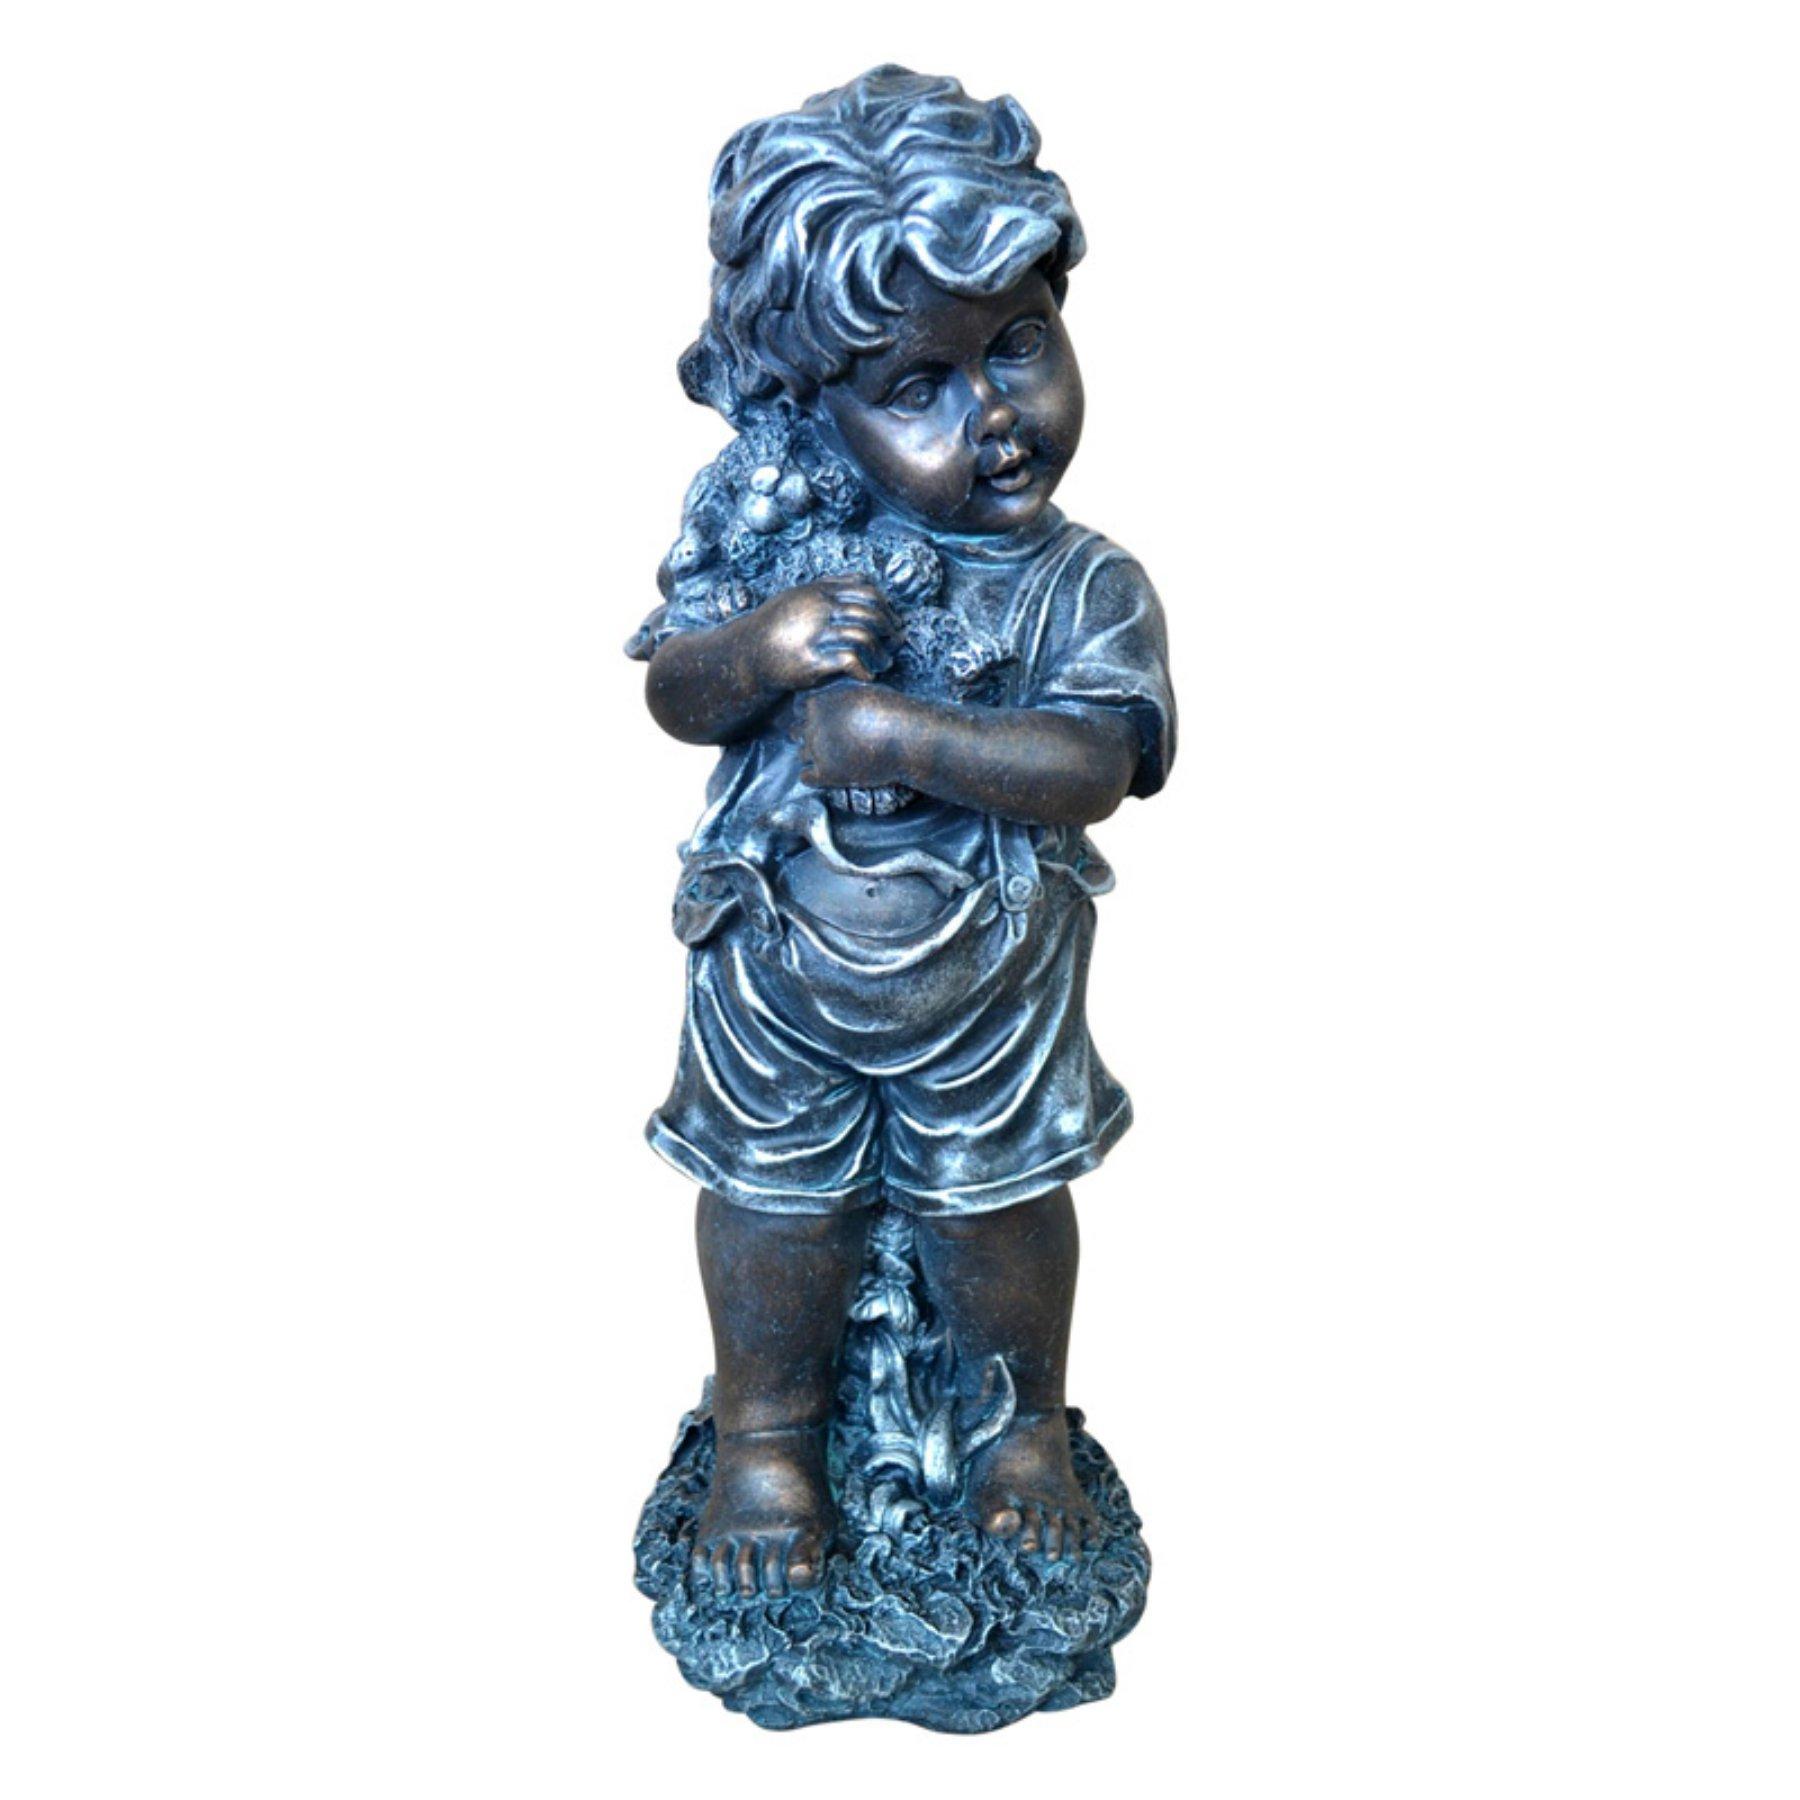 Jeco Boy Copper Garden Statue  Odgd018